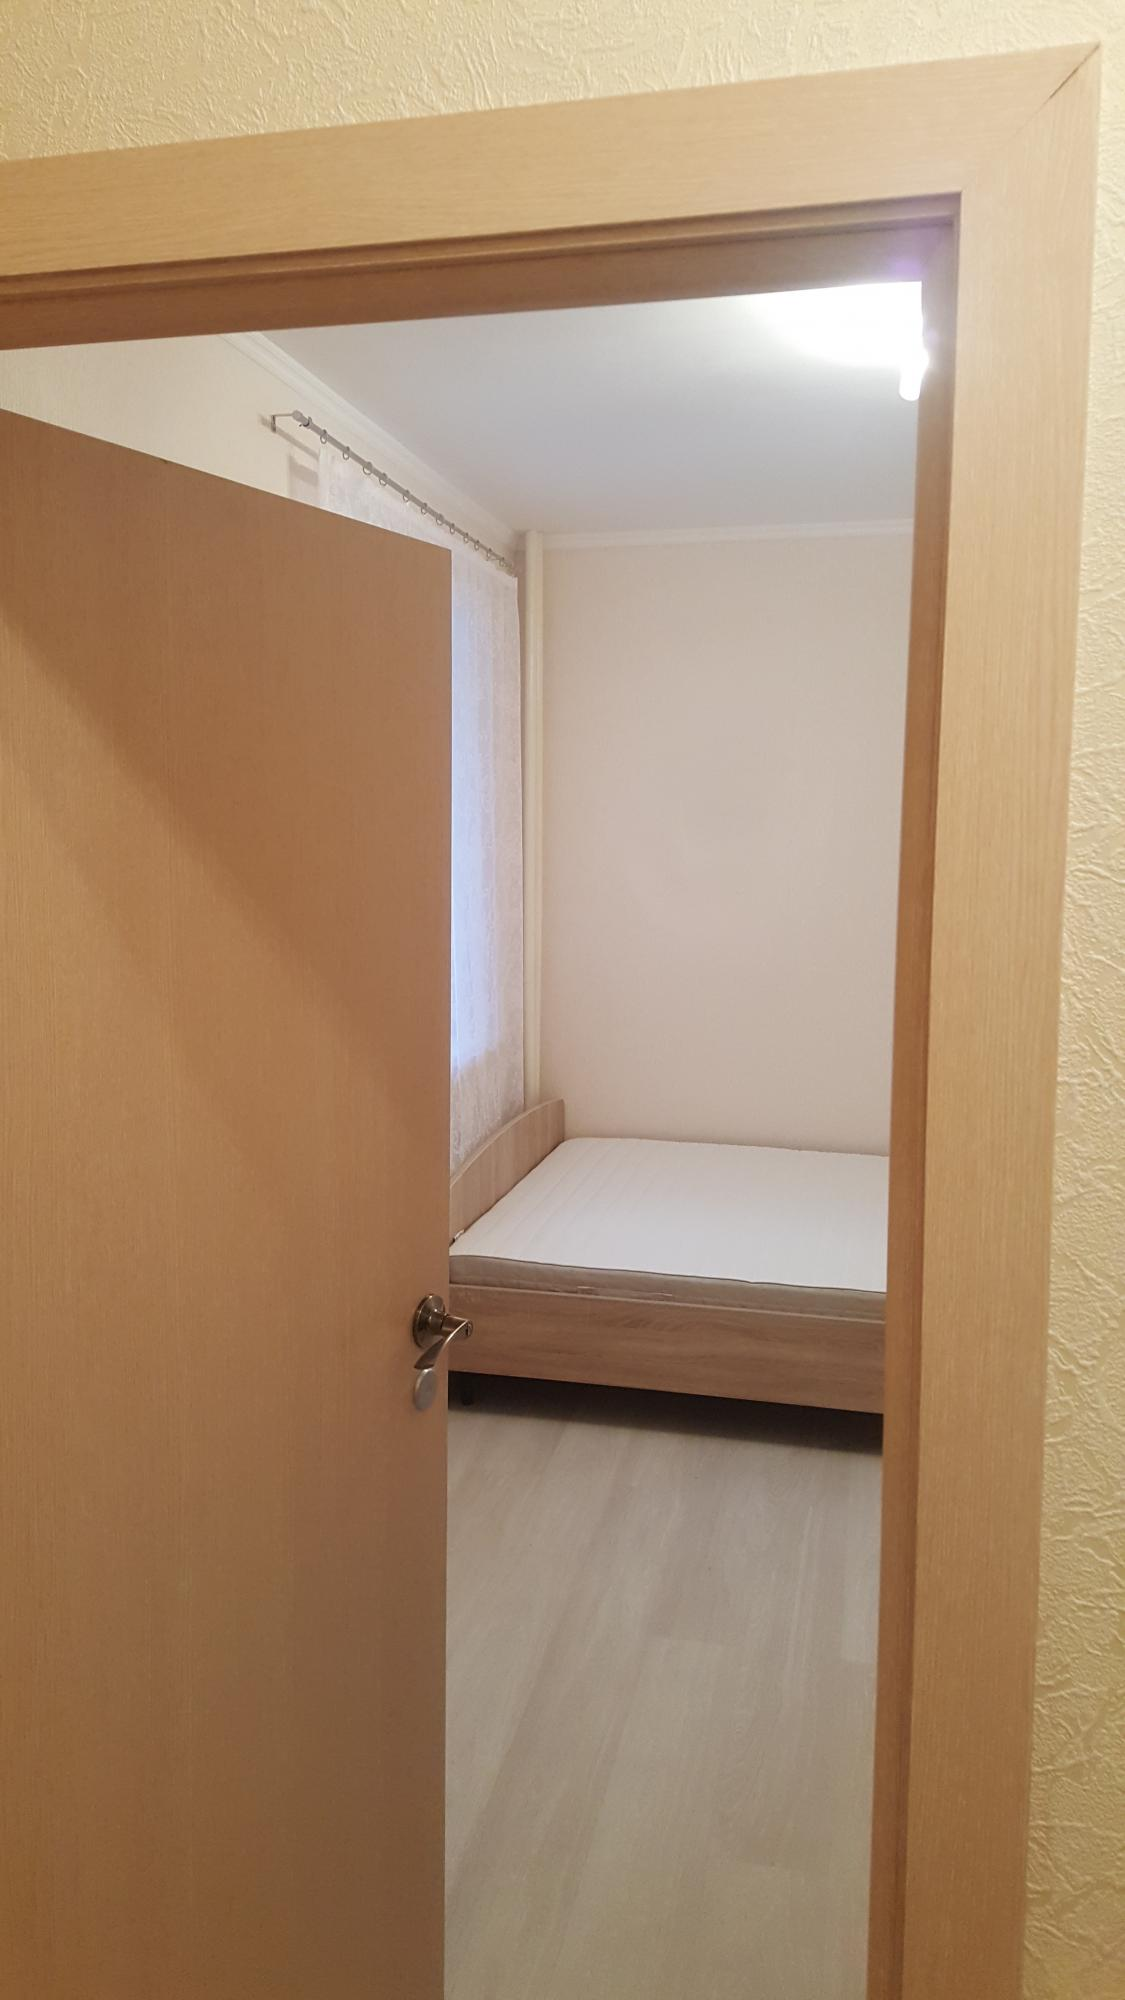 Квартира, 1 комната, 40 м² в Зеленограде 89776541696 купить 1